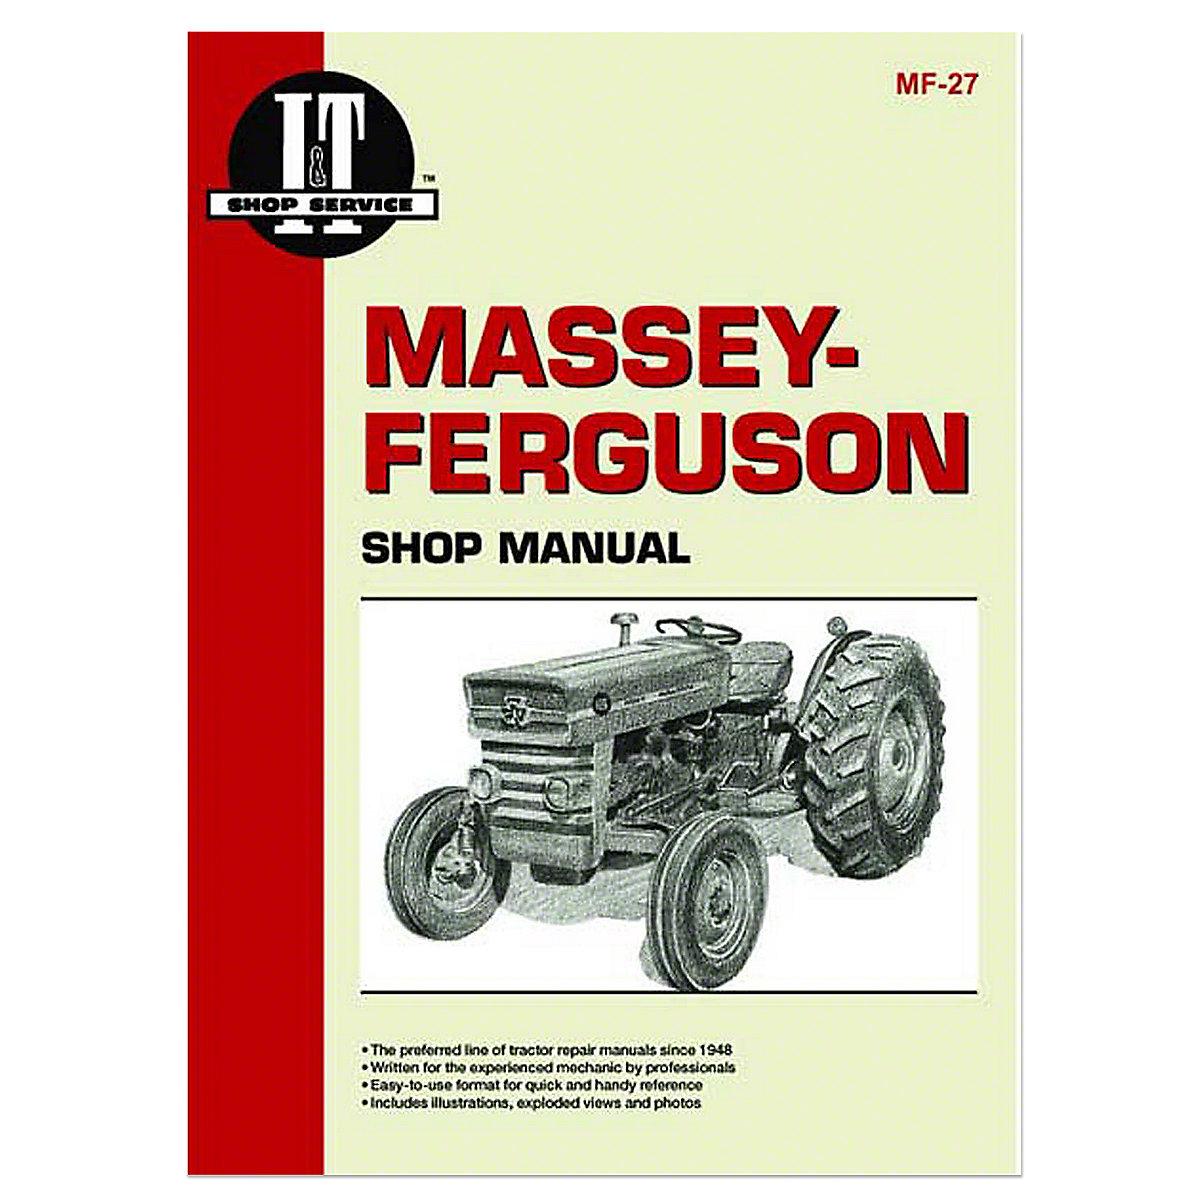 mf27 i t shop service manual rh steinertractor com Massey Ferguson 165 Parts Diagram 165 Massey Ferguson Tractor with Loader